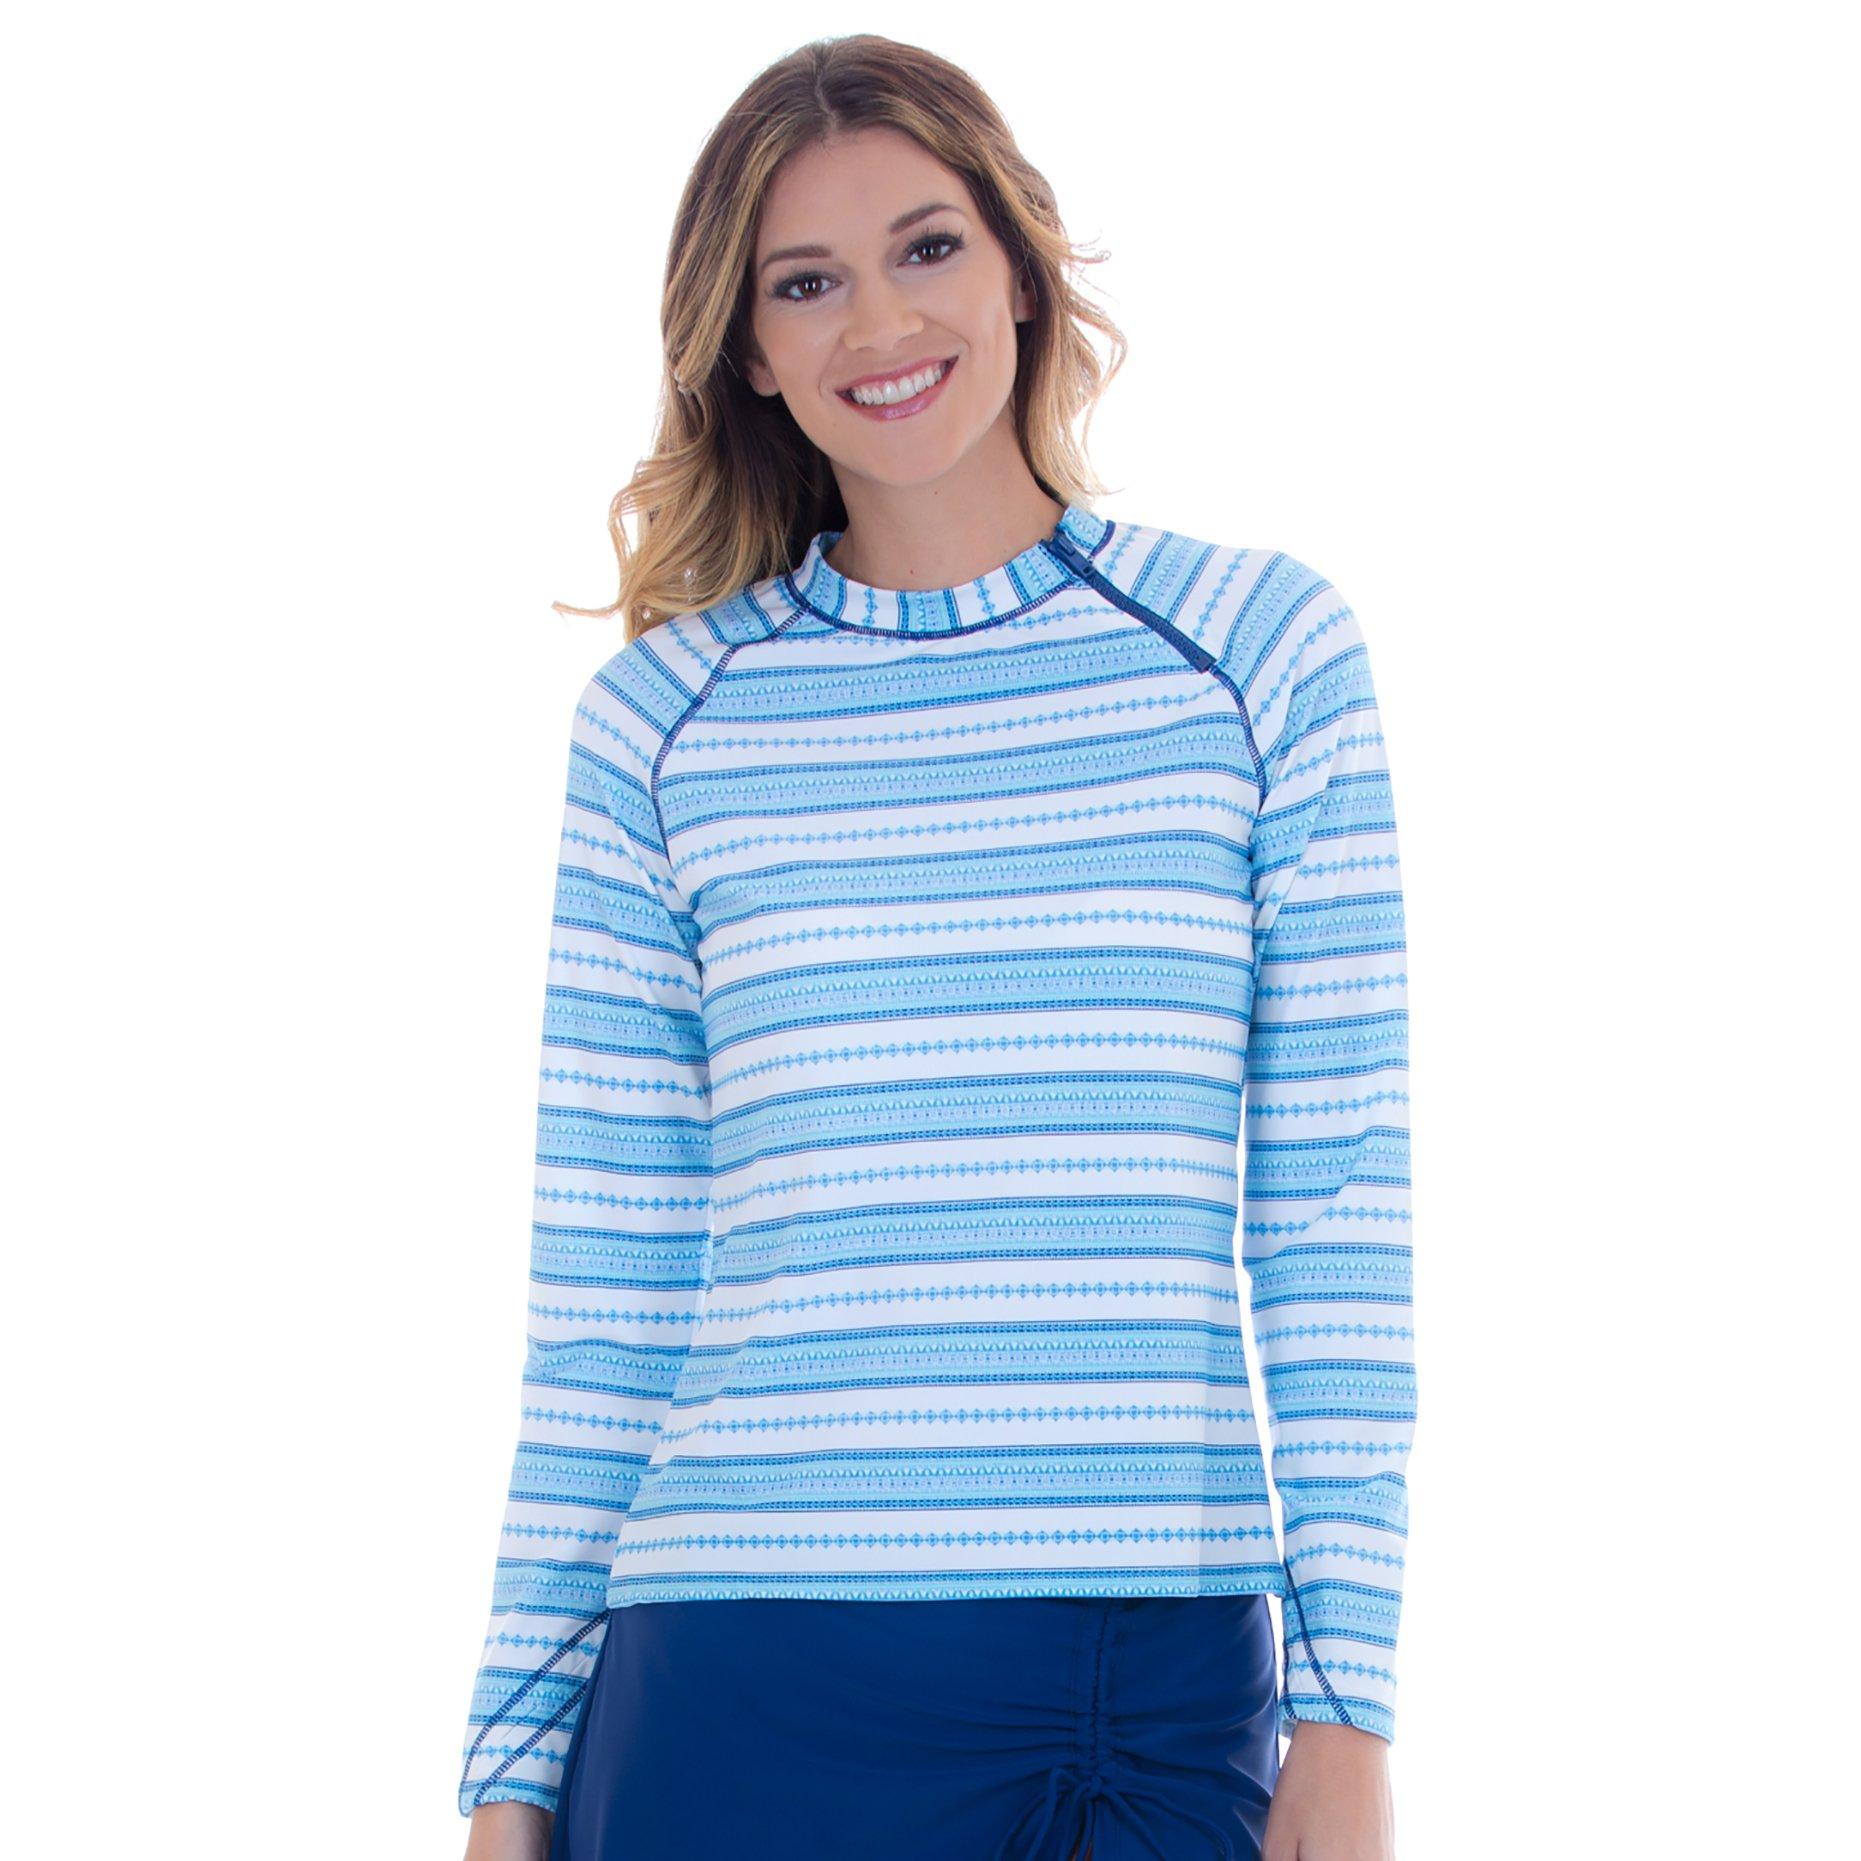 Cabana Life Women's Long Sleeve Zipper Rashguard - Medium - Jewel Stripe